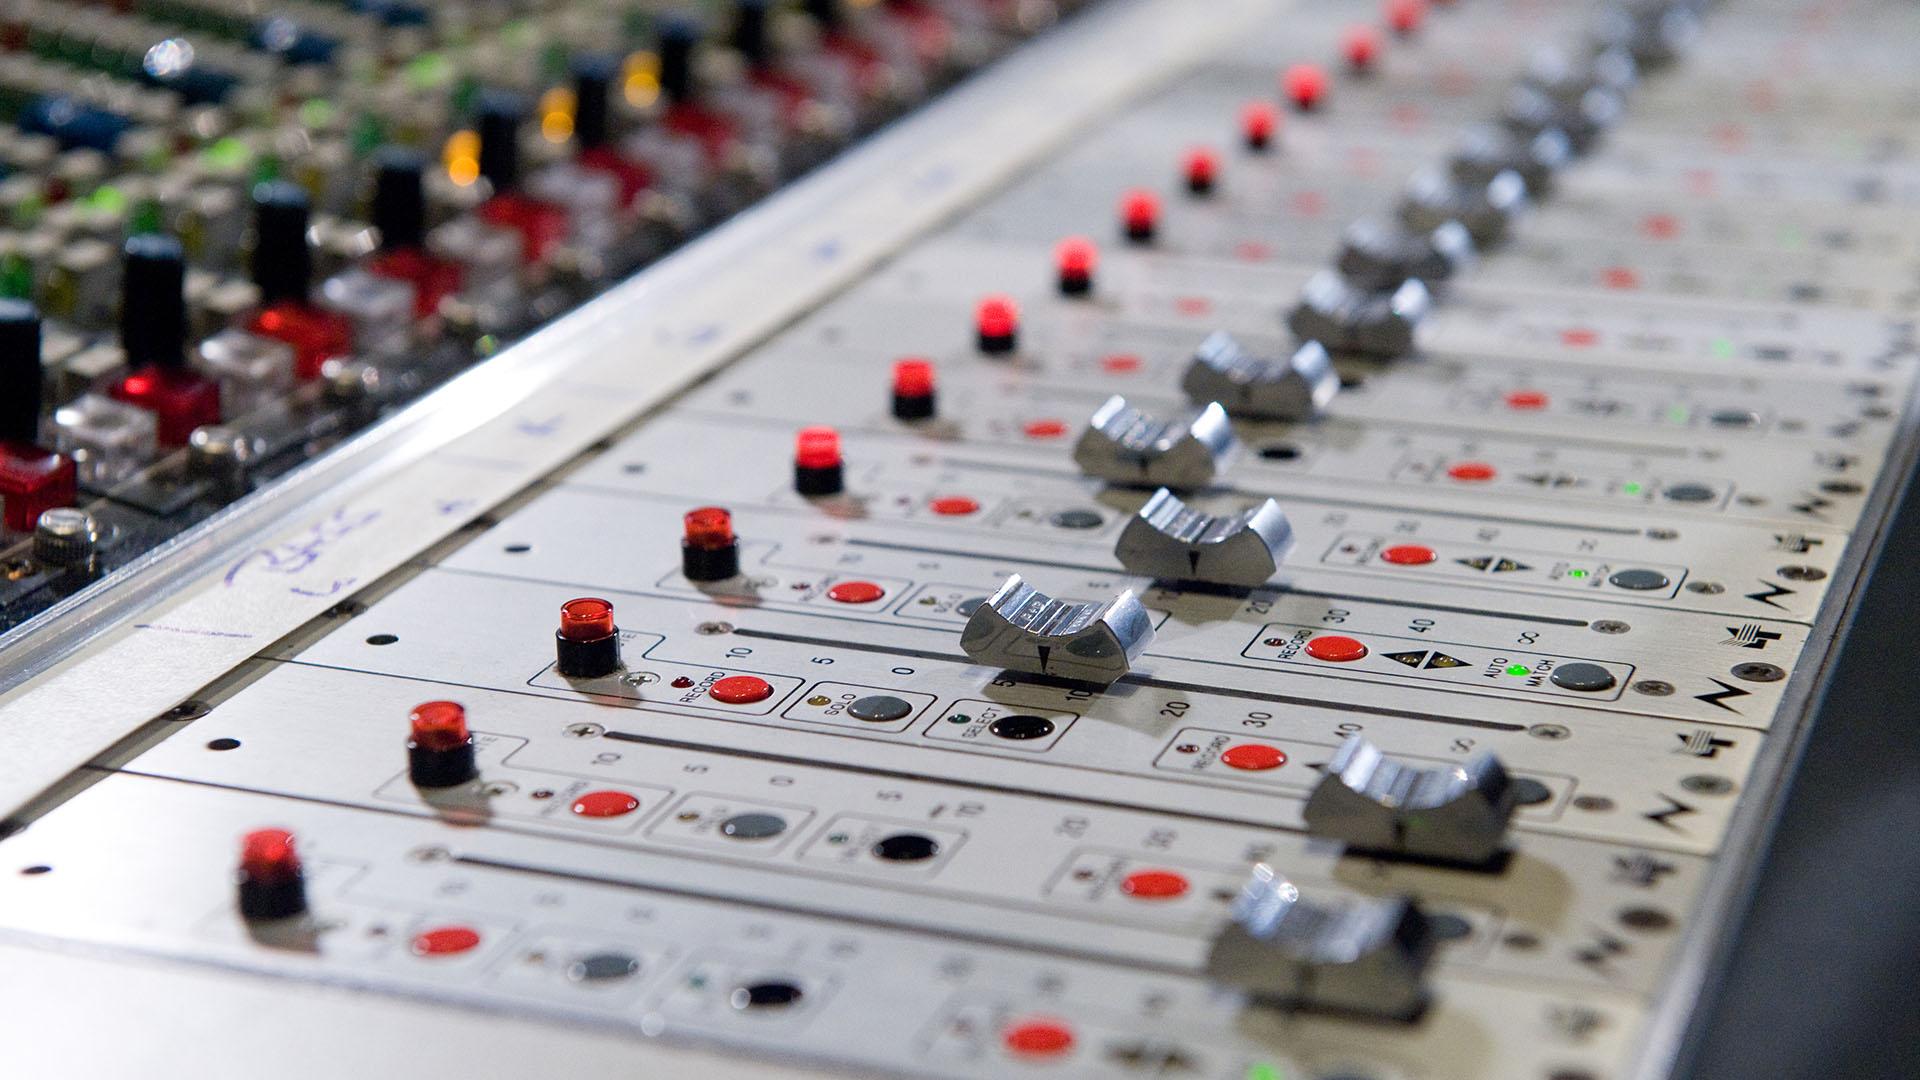 Elements of Soundbreaking